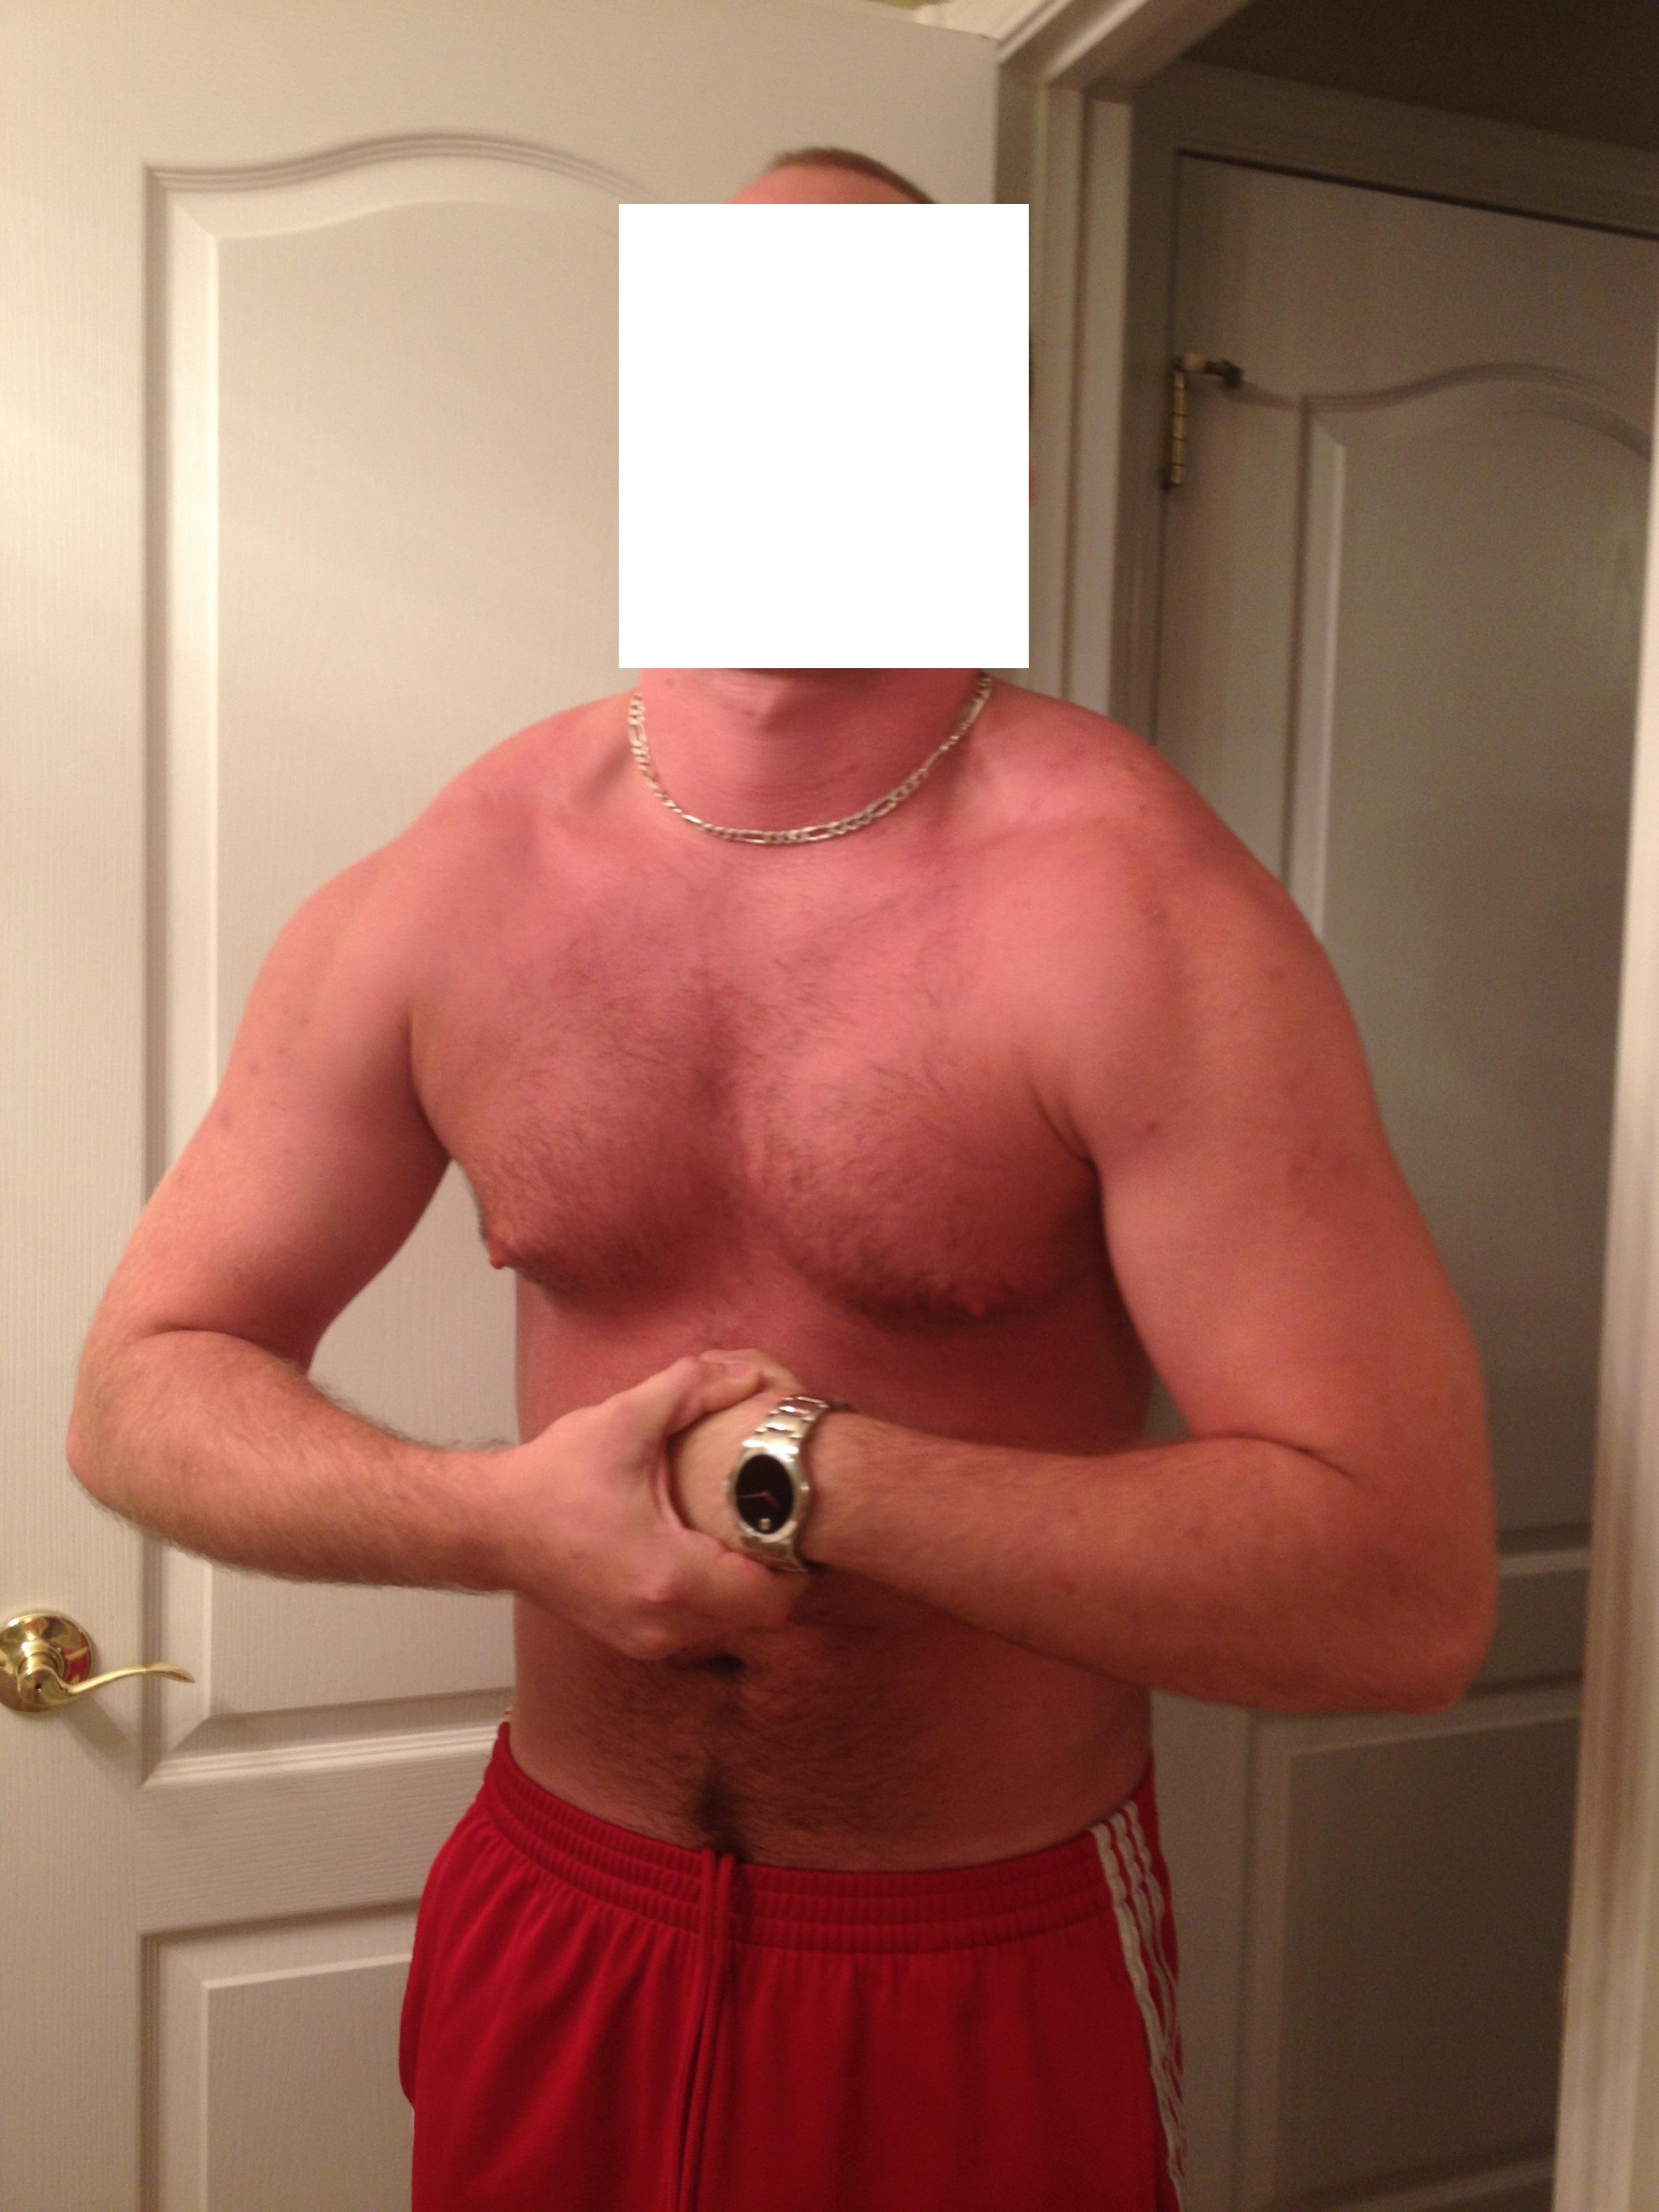 prednisone steroid muscle building